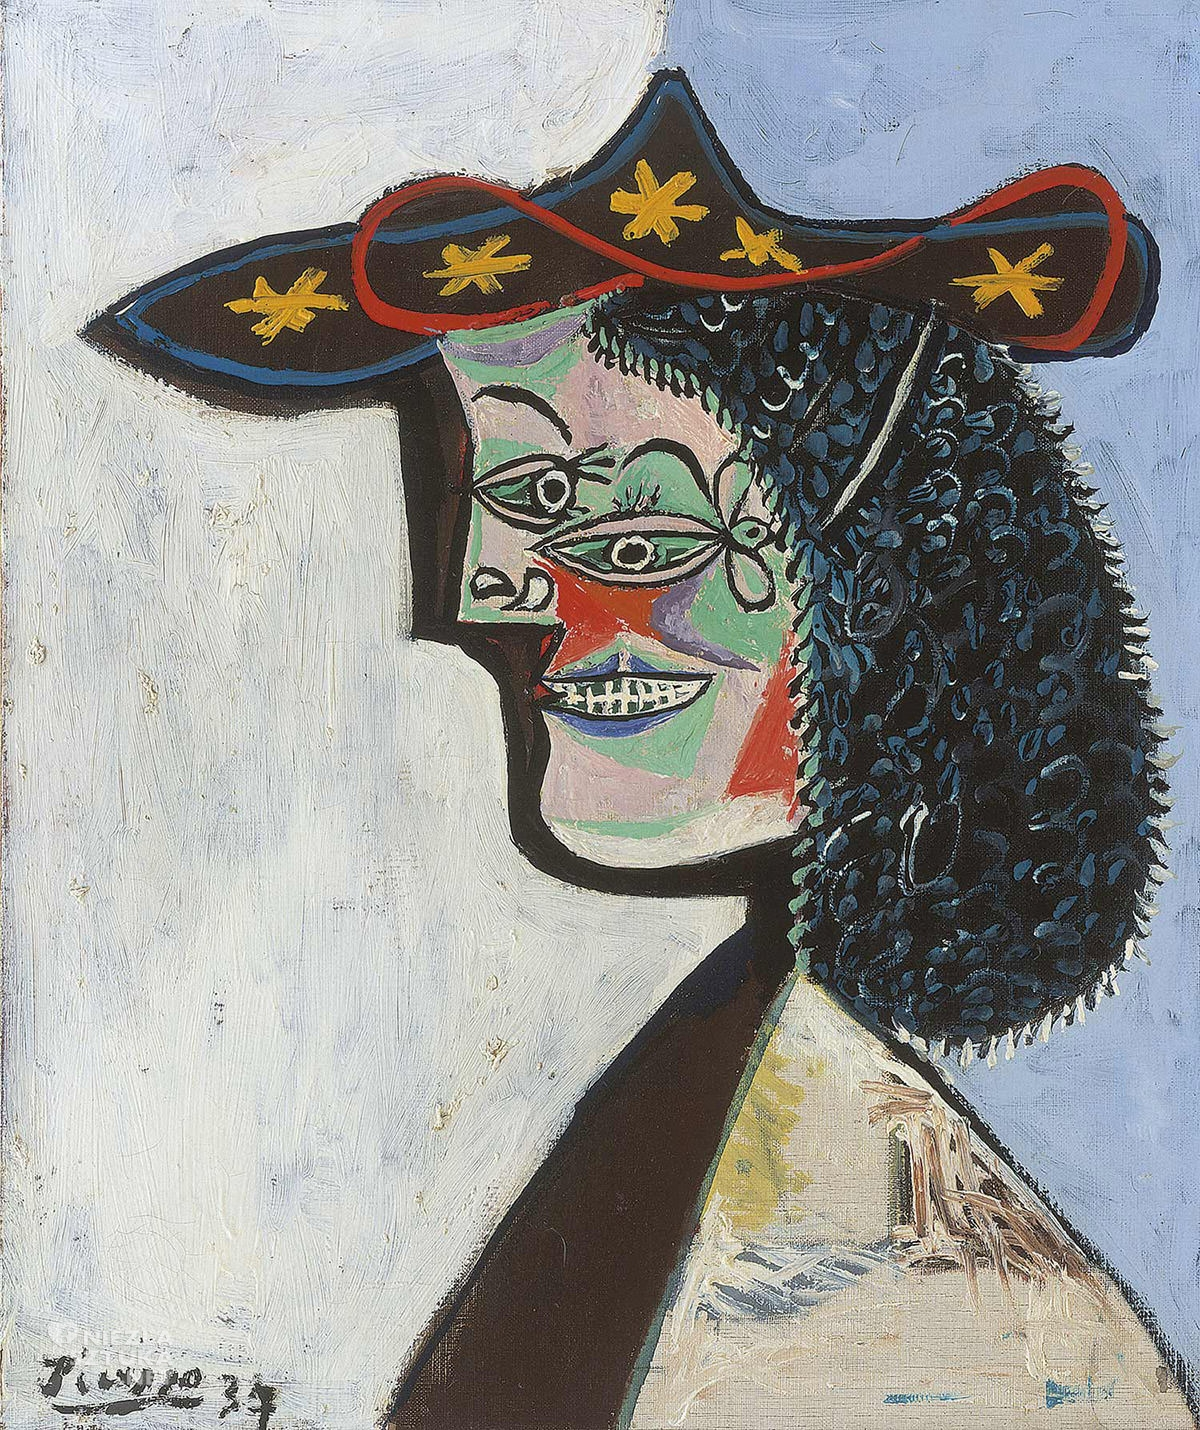 Pablo Picasso, muza, Nusch Eluard, obraz, portret, niezła sztuka